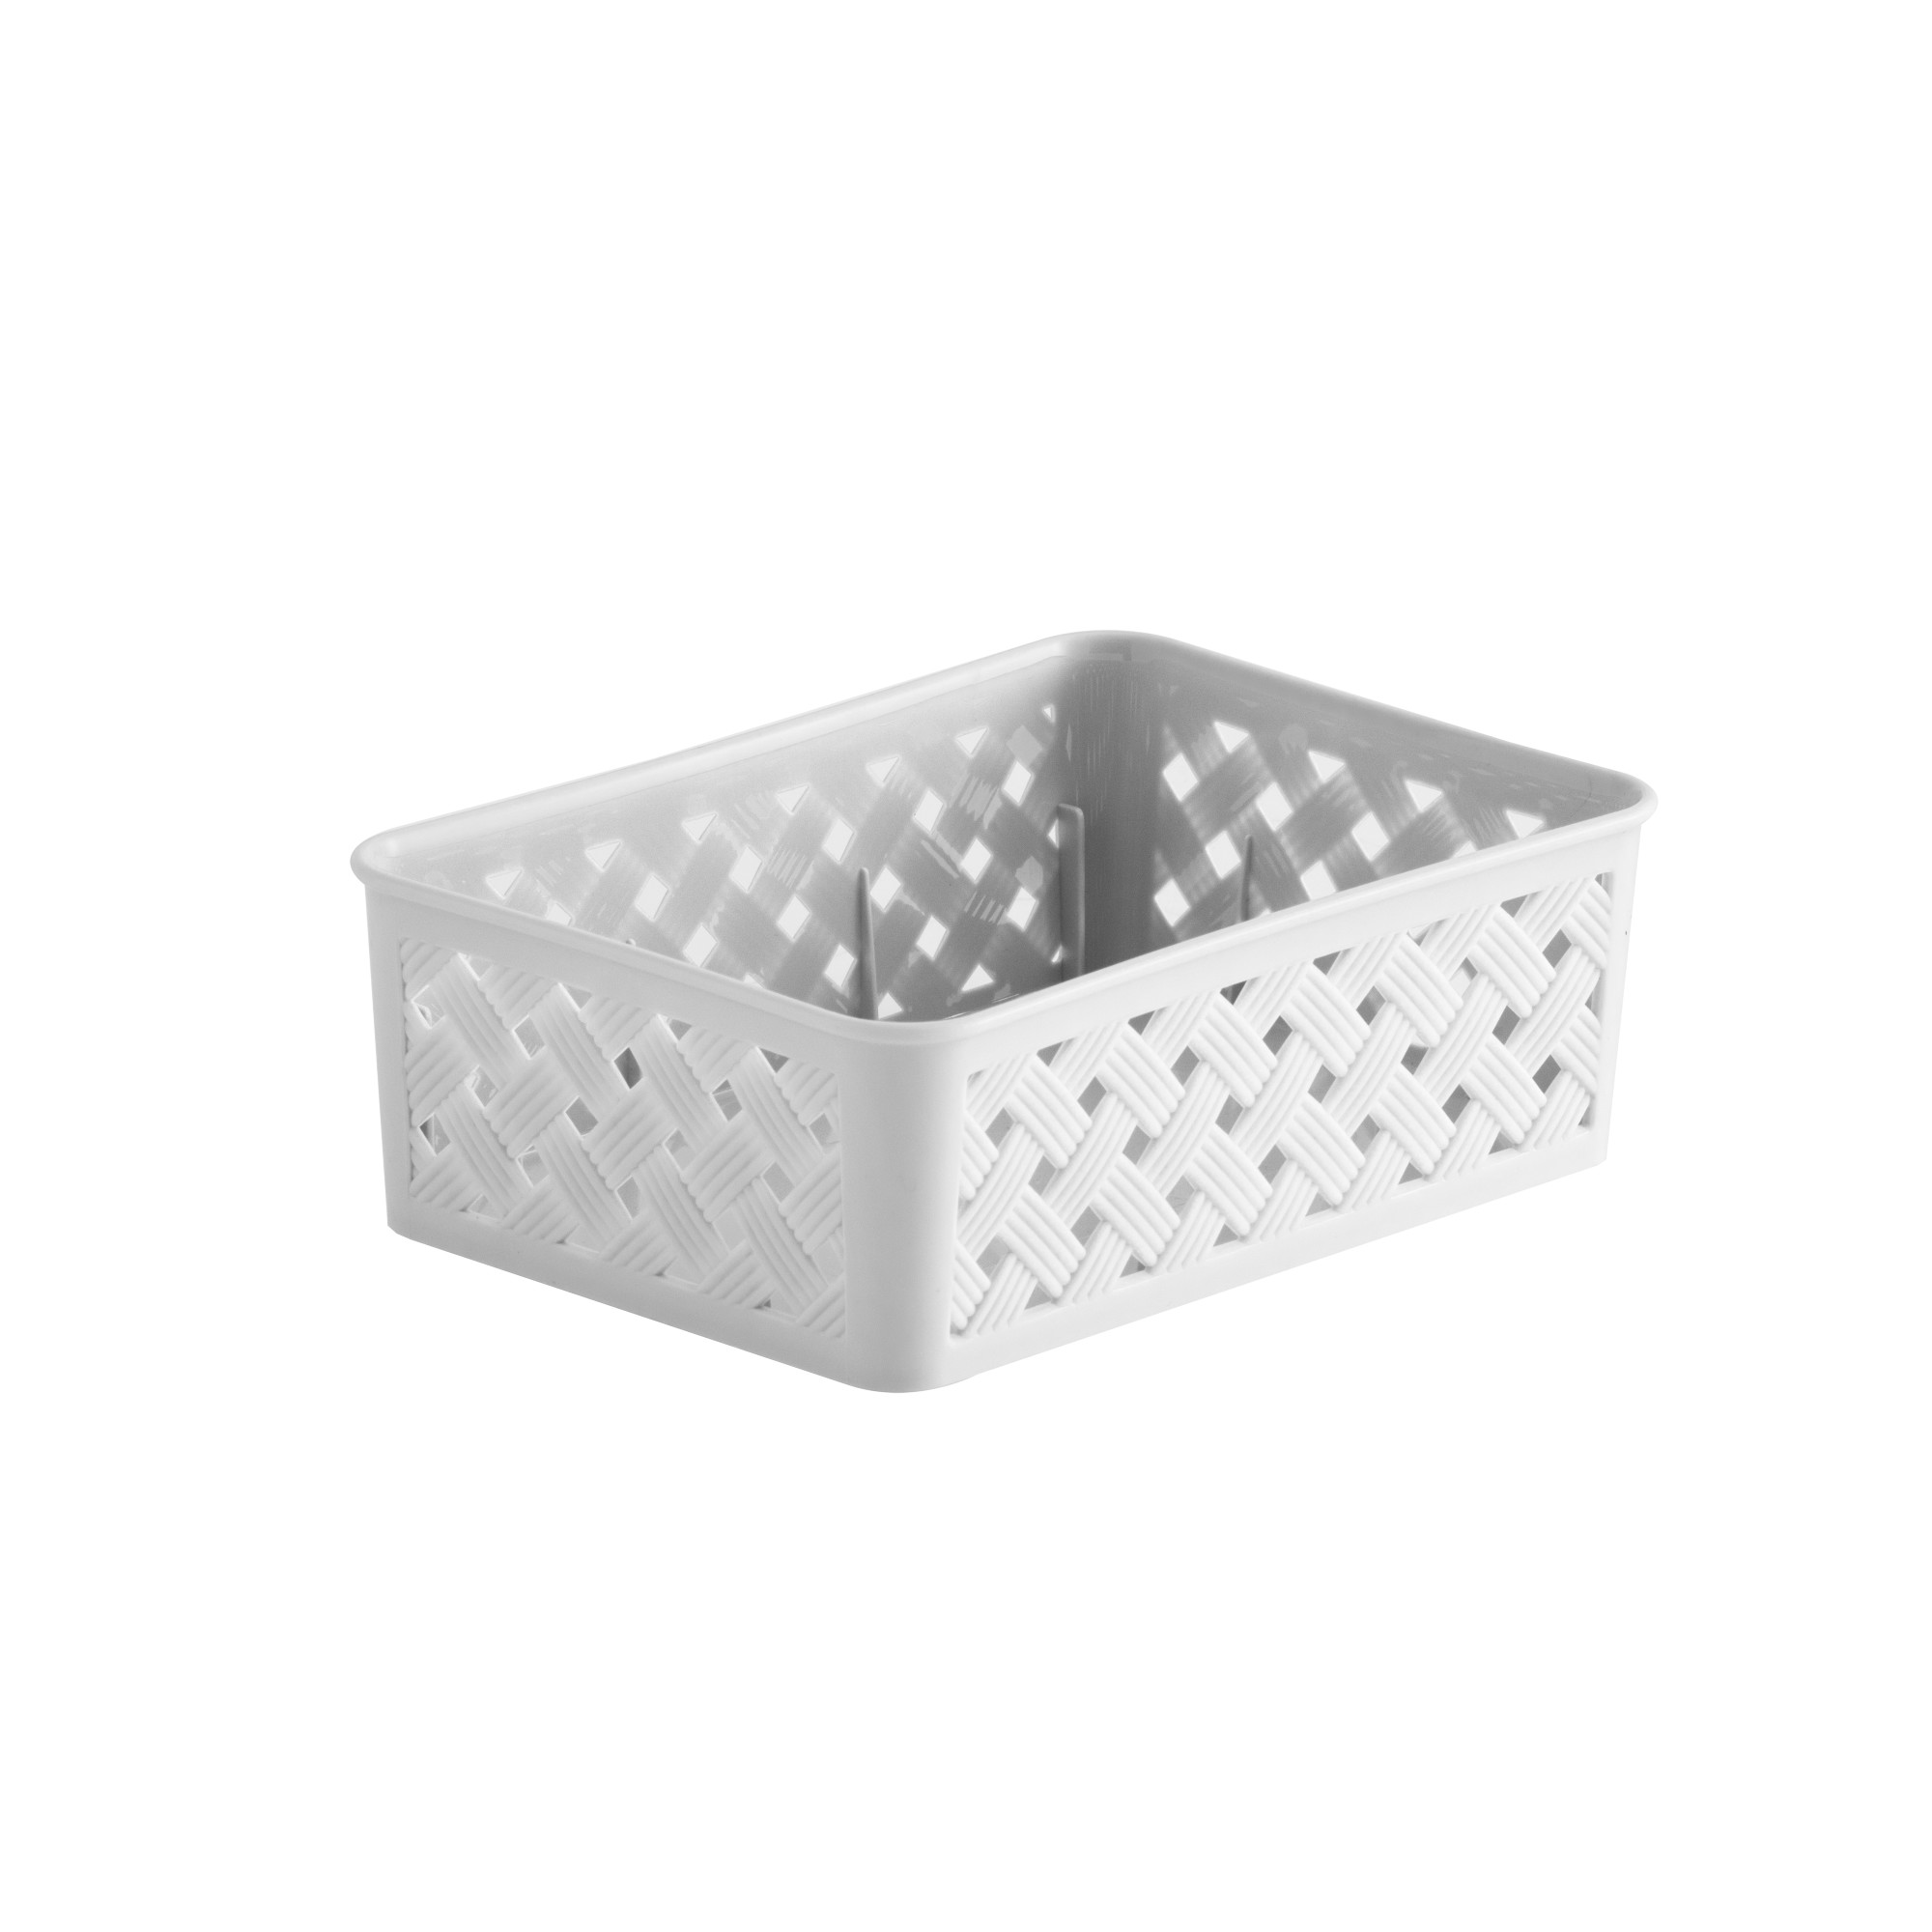 Cesta Organizadora de Plastico 13x19 cm Branca - Paramount